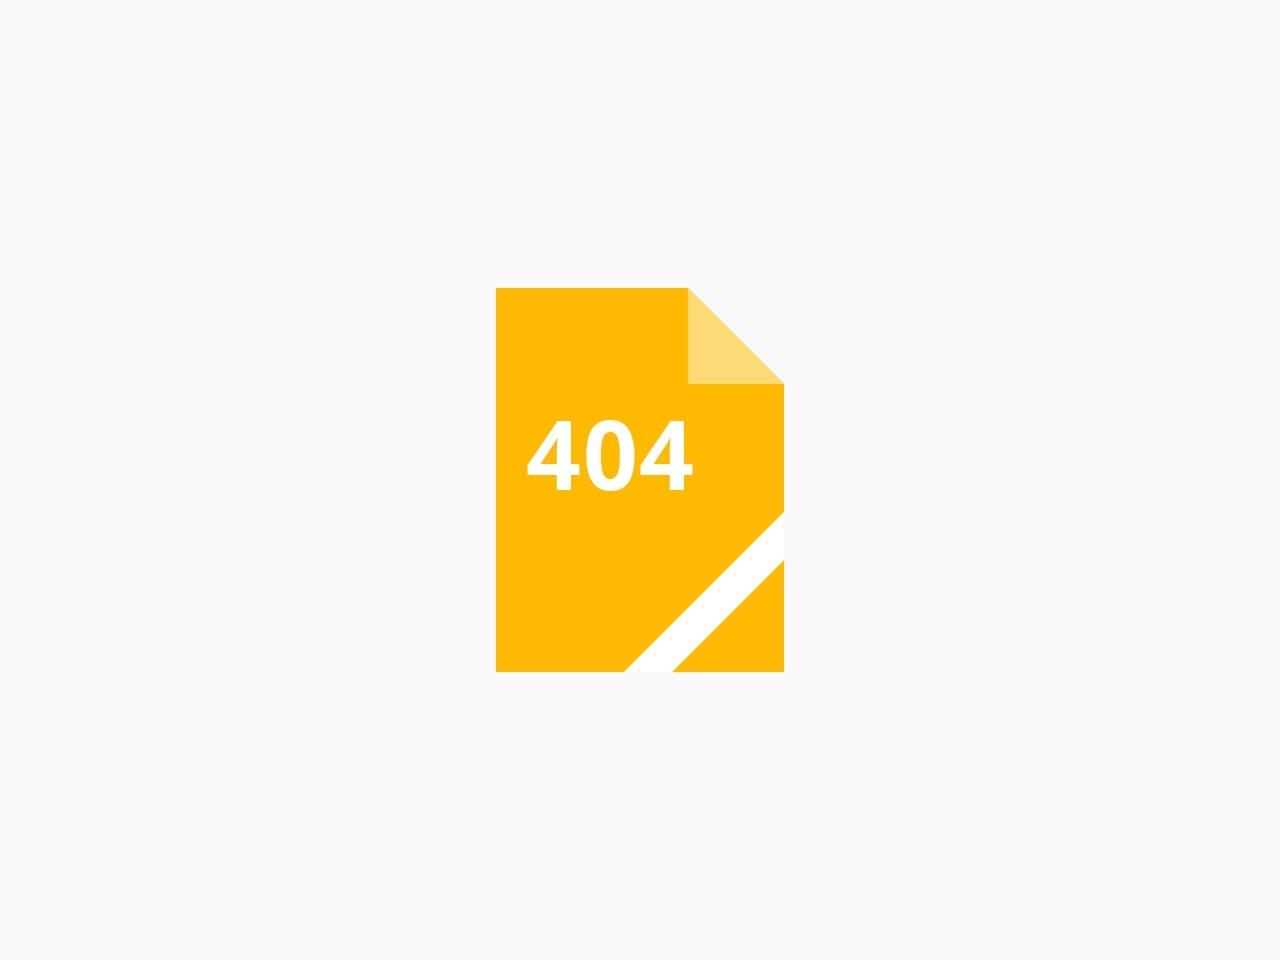 BMステーキ目黒店